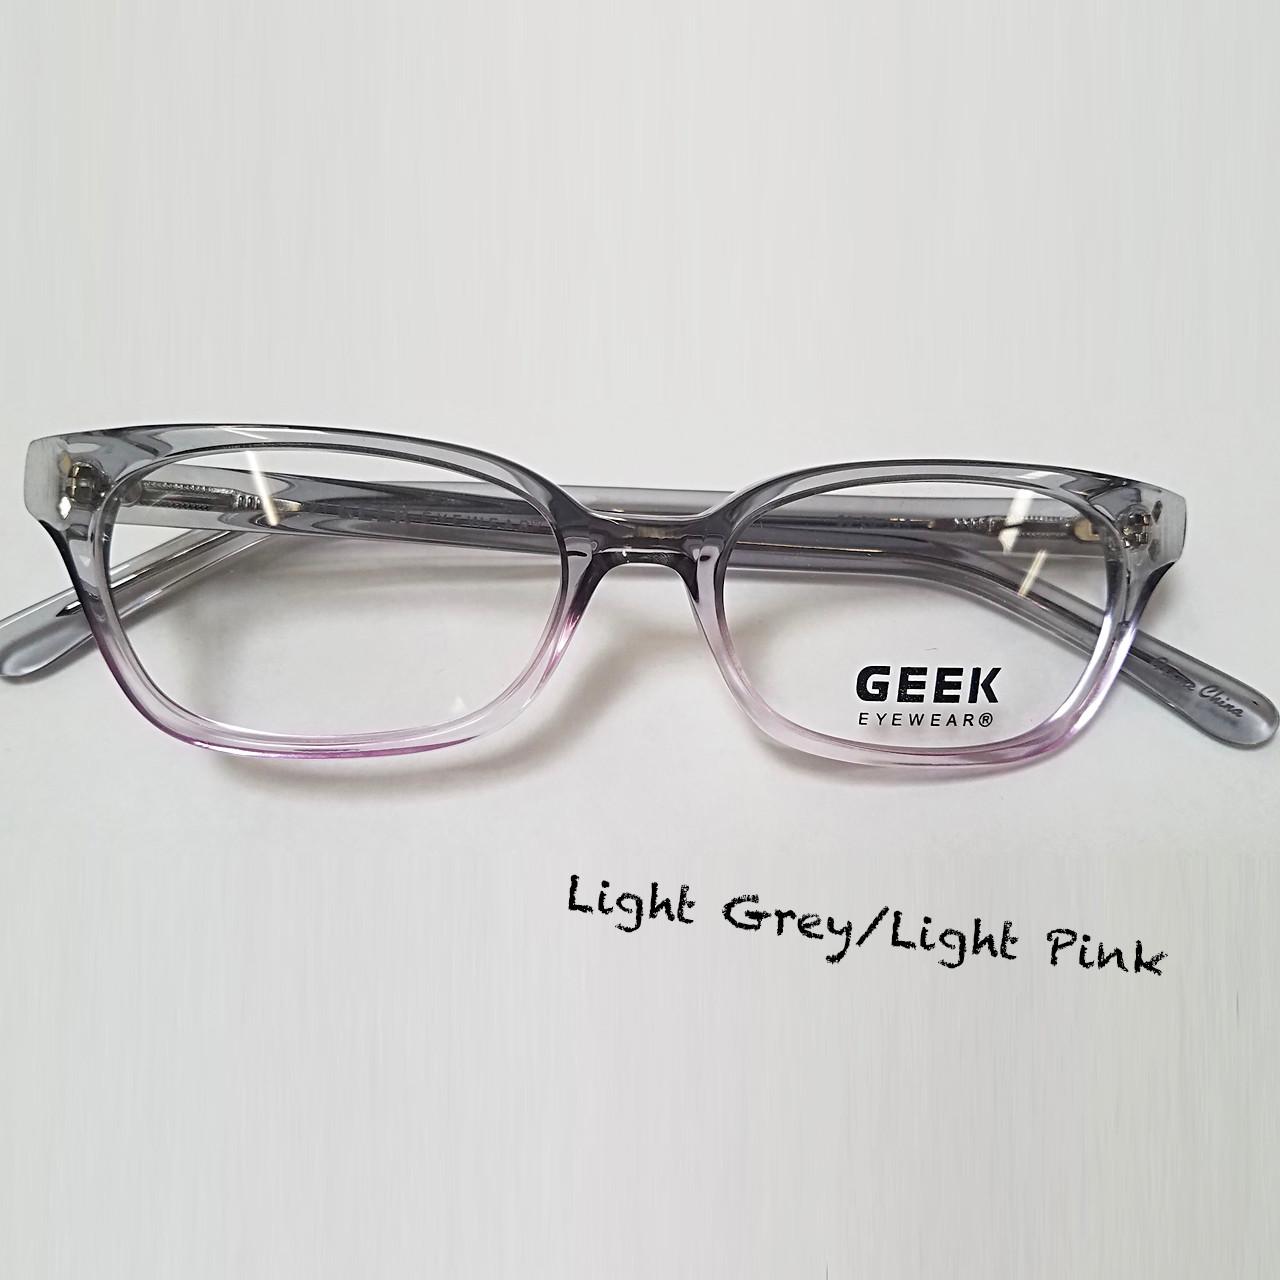 GEEK Eyewear GEEK 121